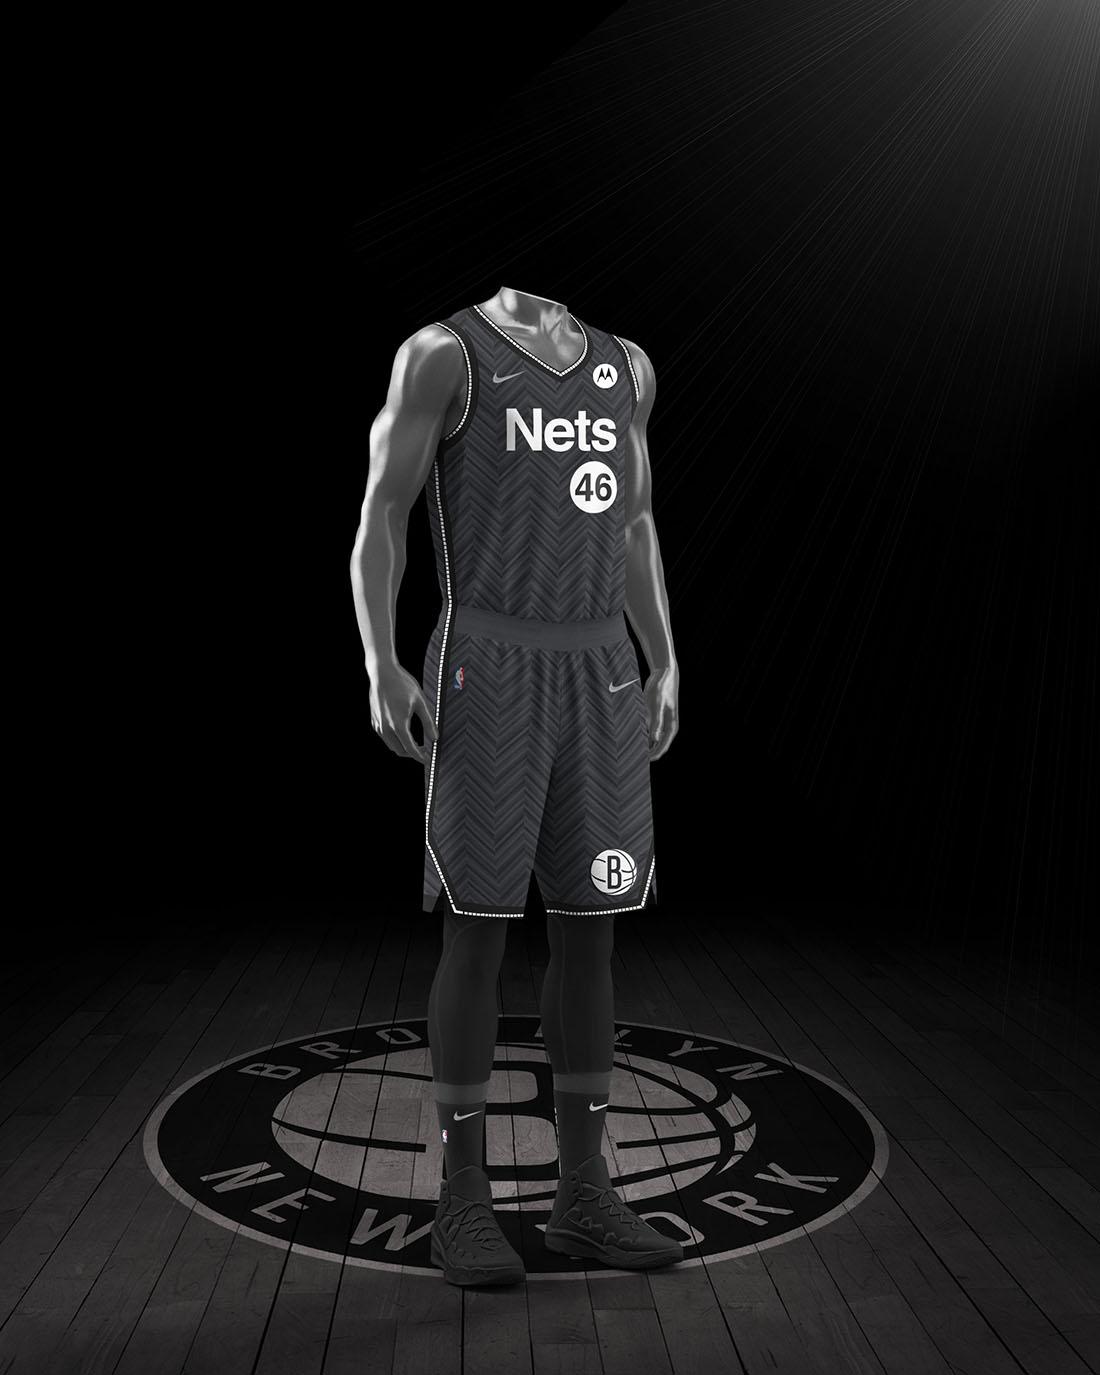 Nike x NBA Earned Edition 2020-21 - Brooklyn Nets